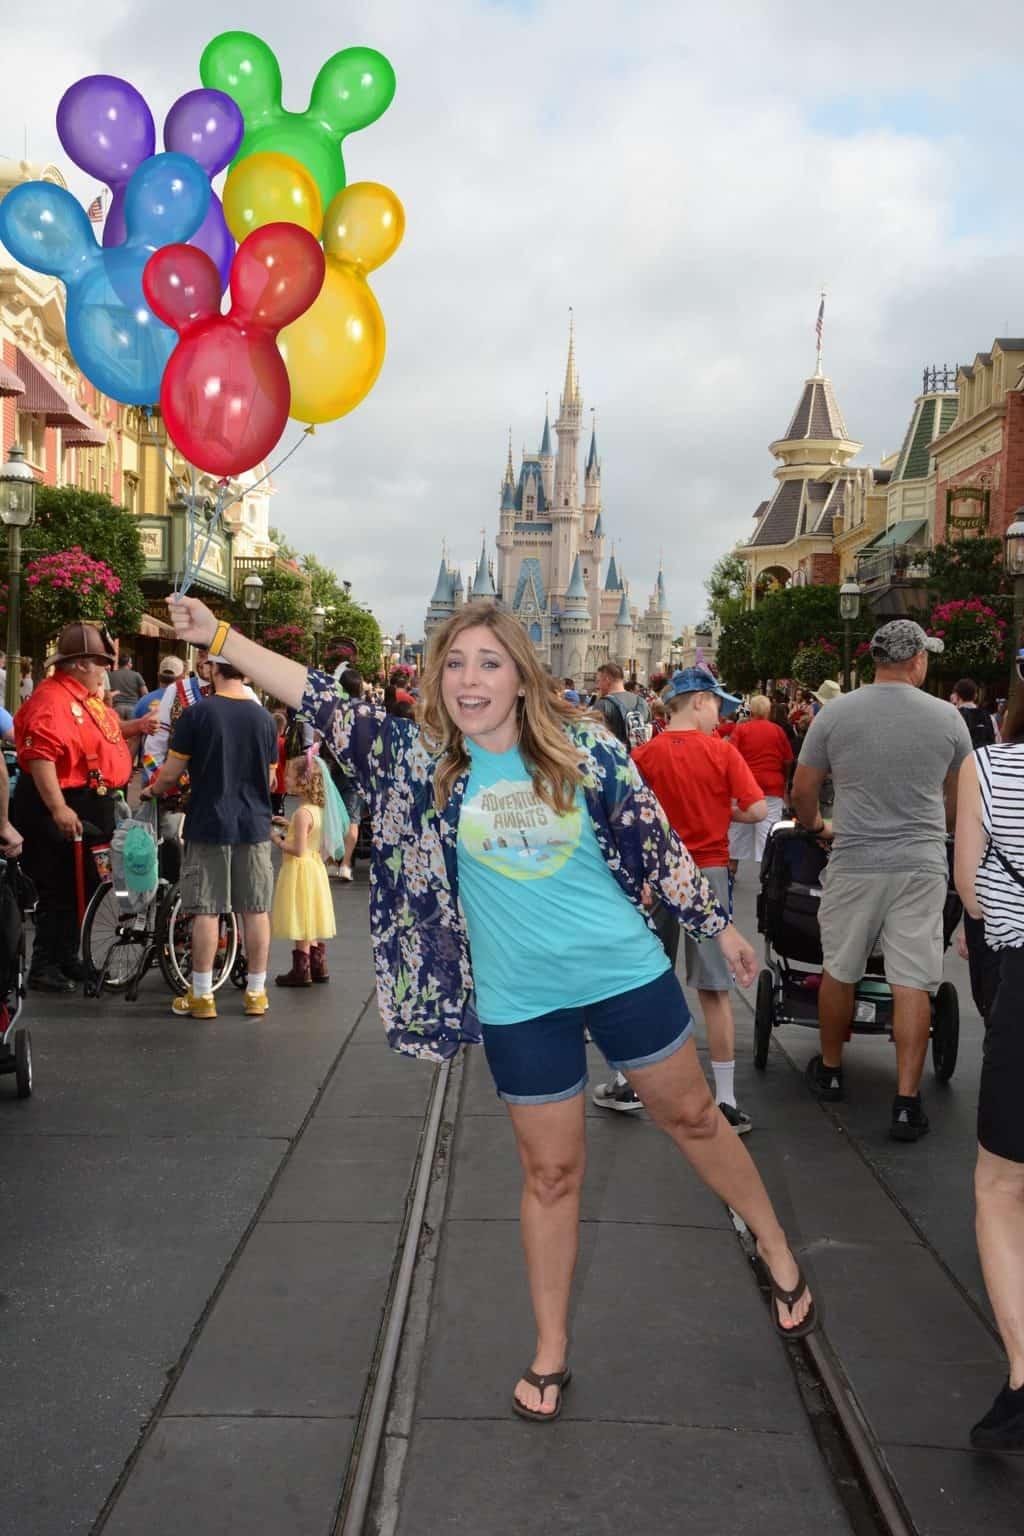 magic castle photos